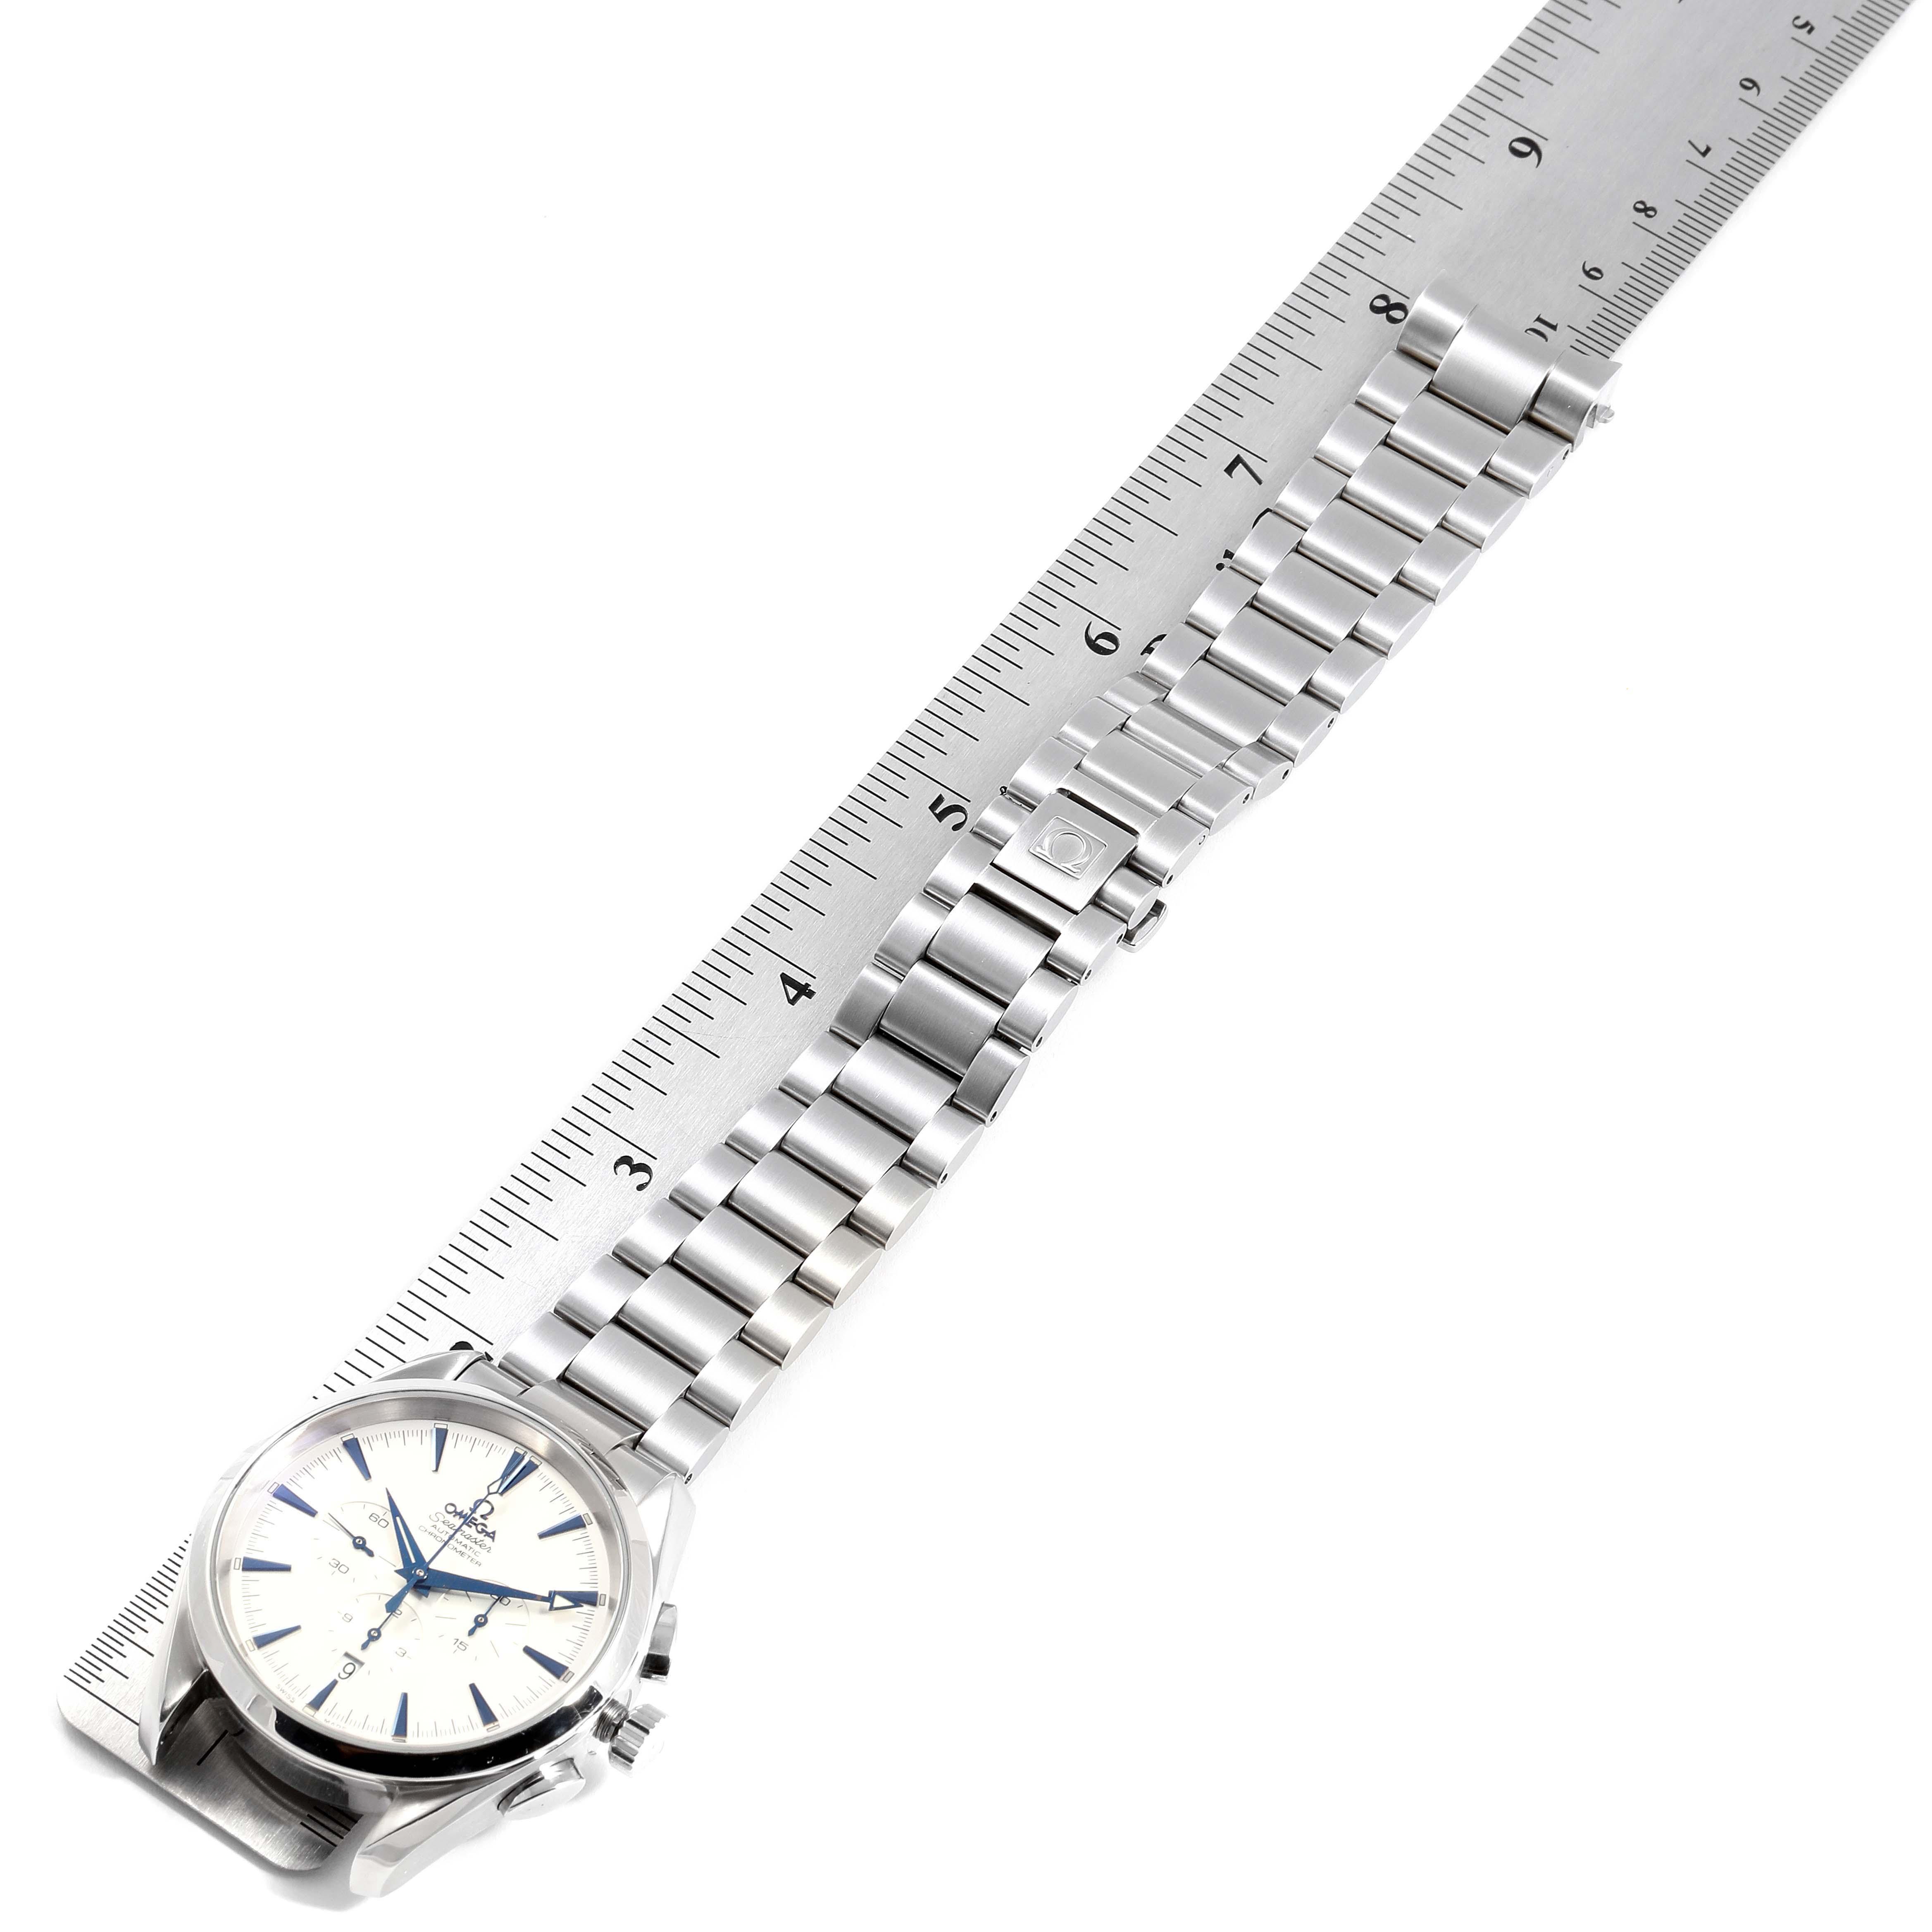 Omega Seamaster Aqua Terra XL Chronograph Watch 2512.30.00 Card SwissWatchExpo